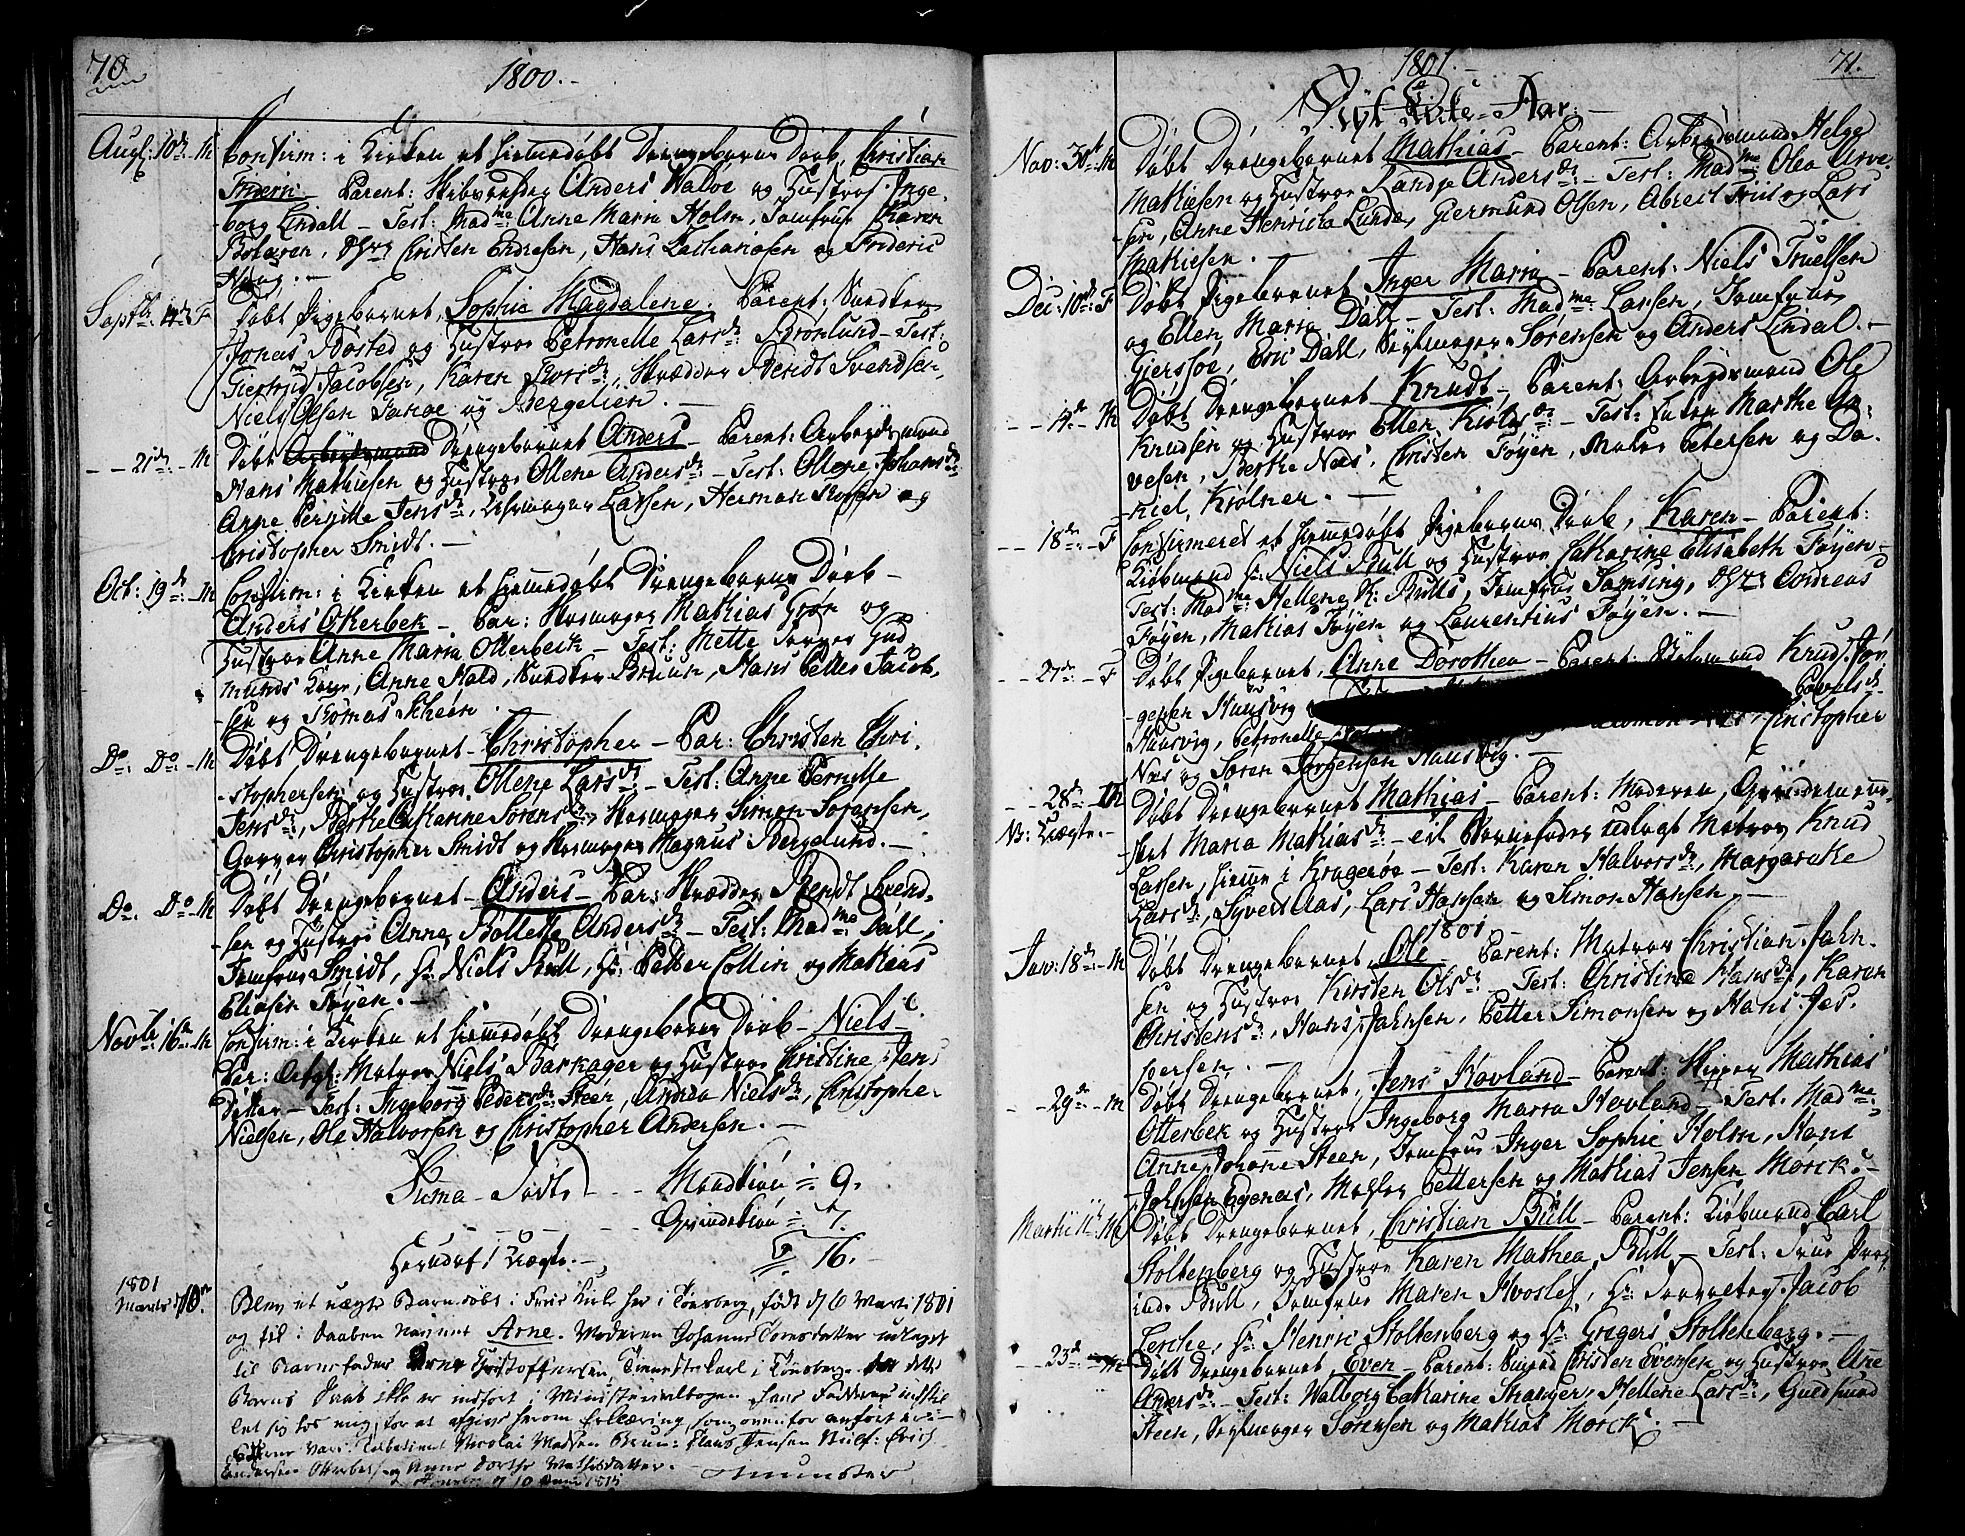 SAKO, Tønsberg kirkebøker, F/Fa/L0003: Ministerialbok nr. I 3, 1797-1814, s. 70-71